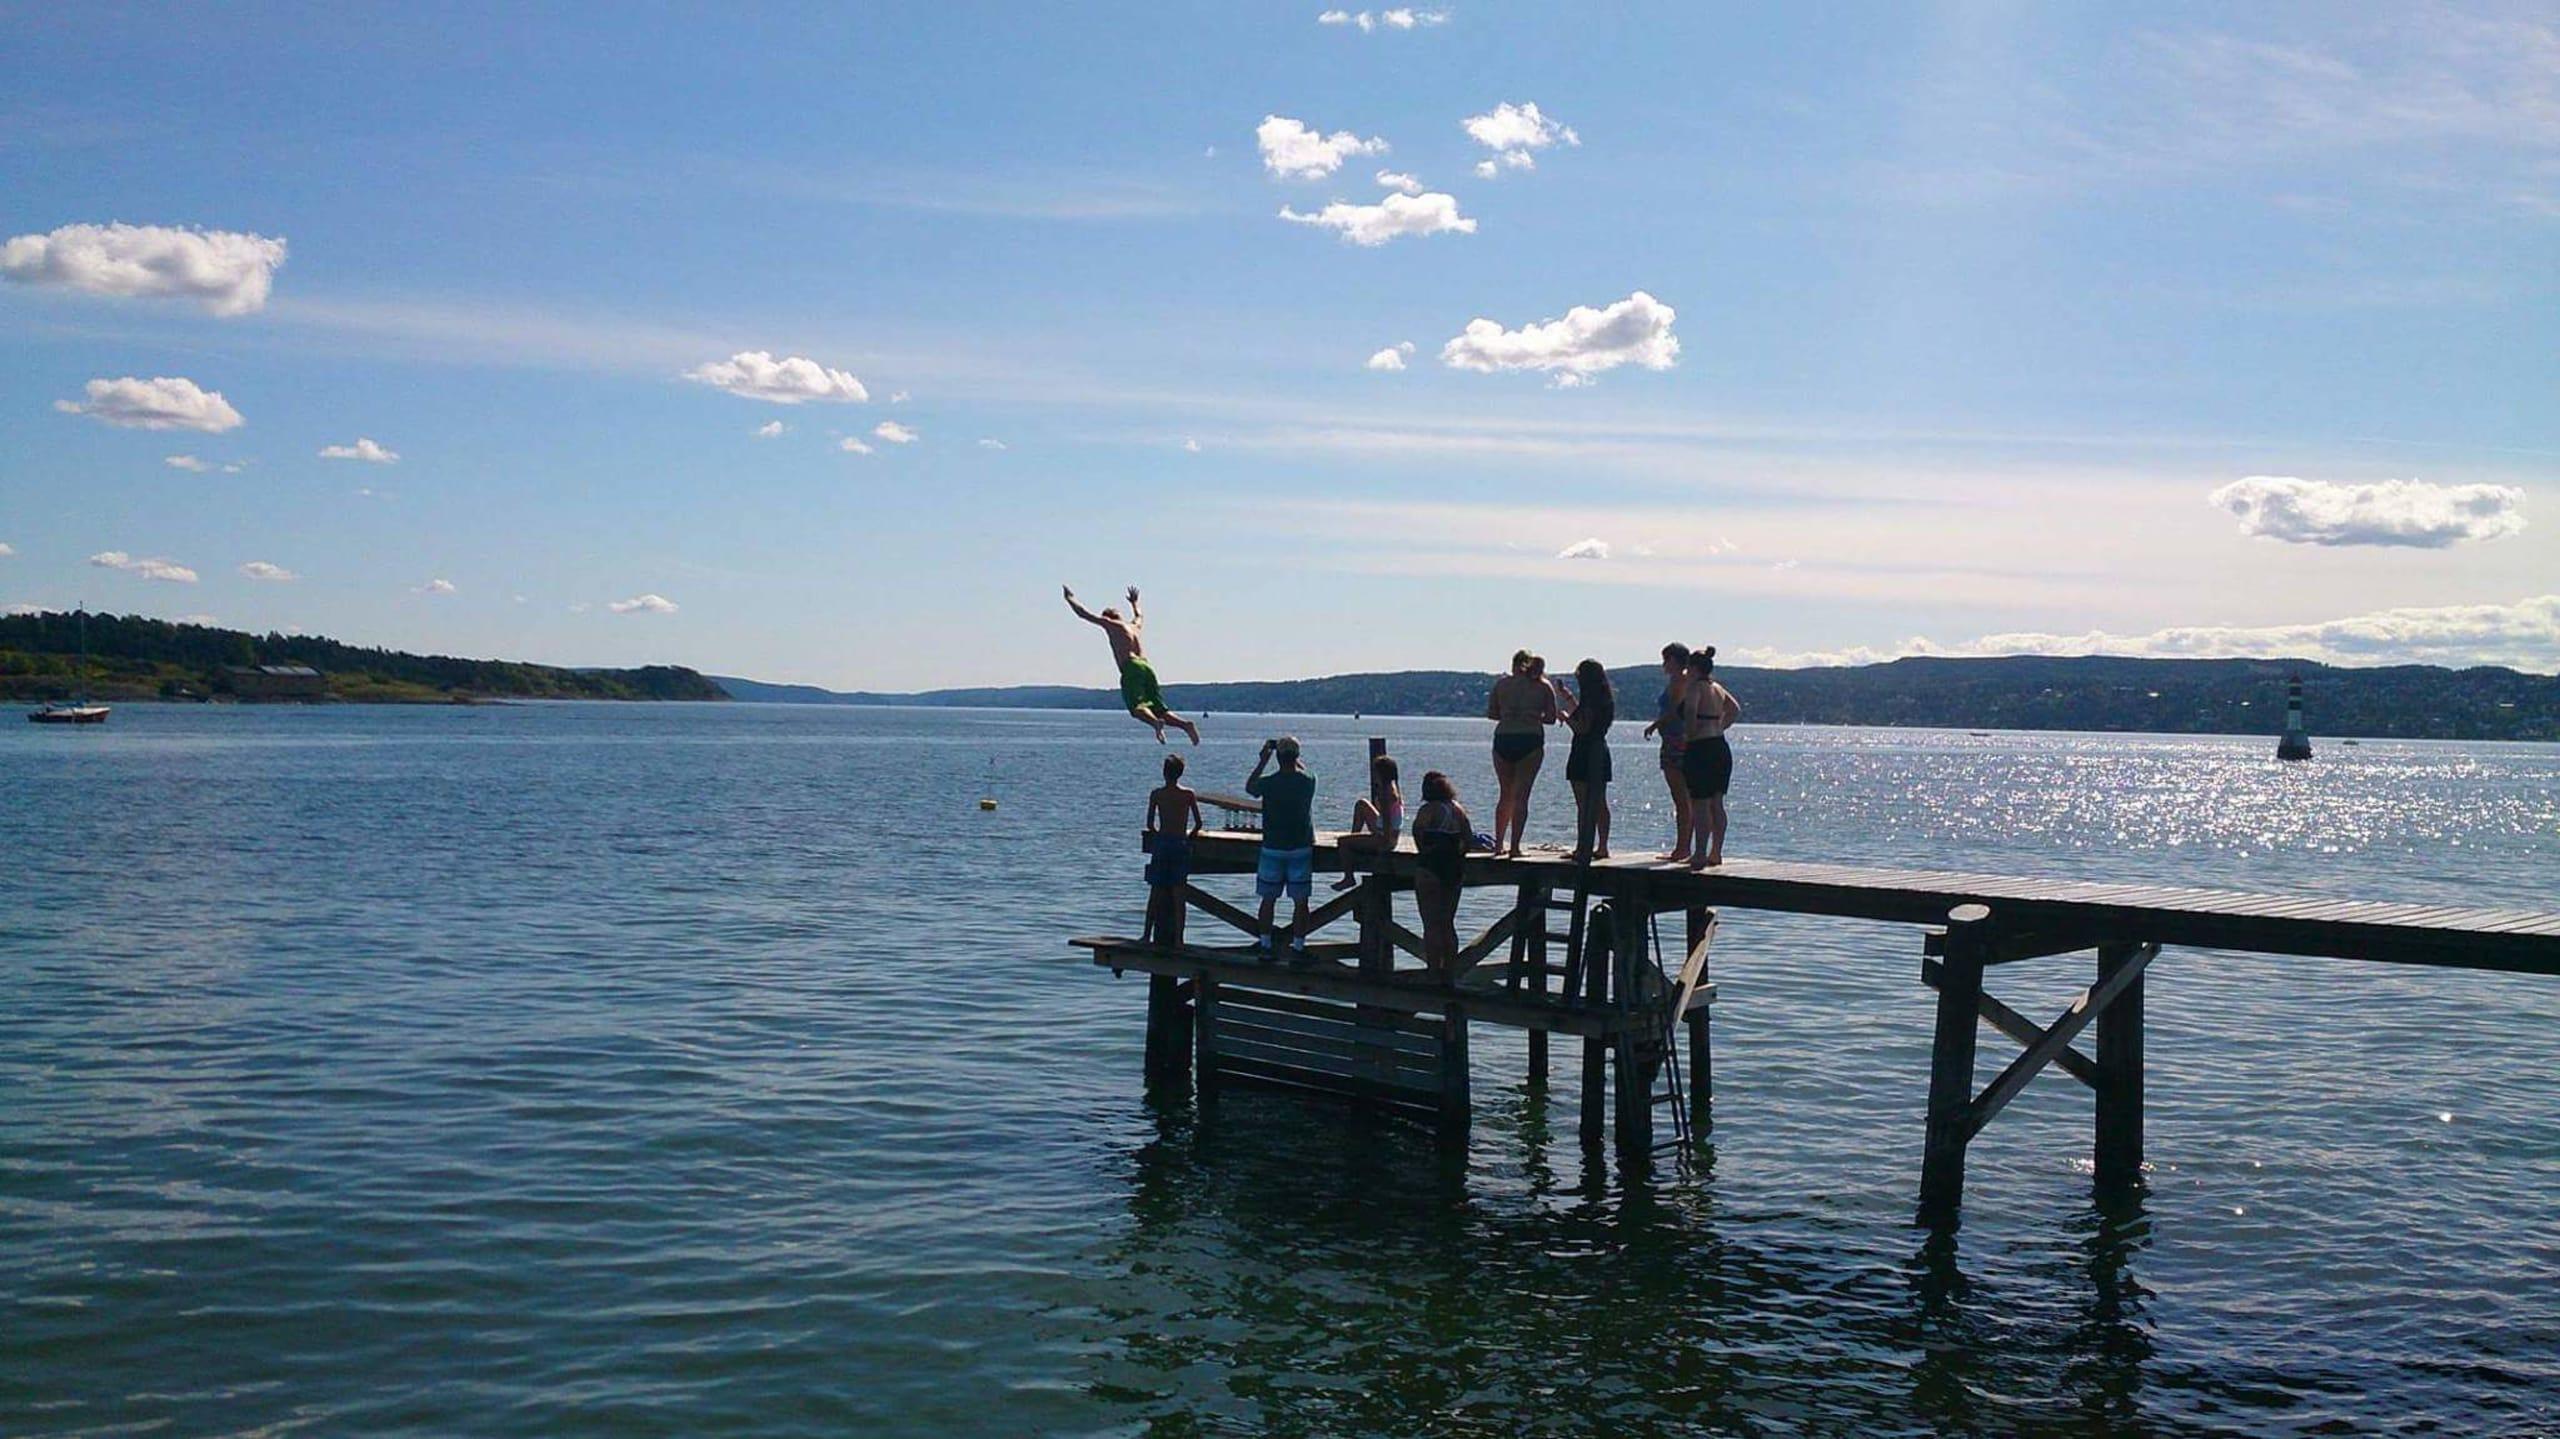 Man jumping into the Oslofjord